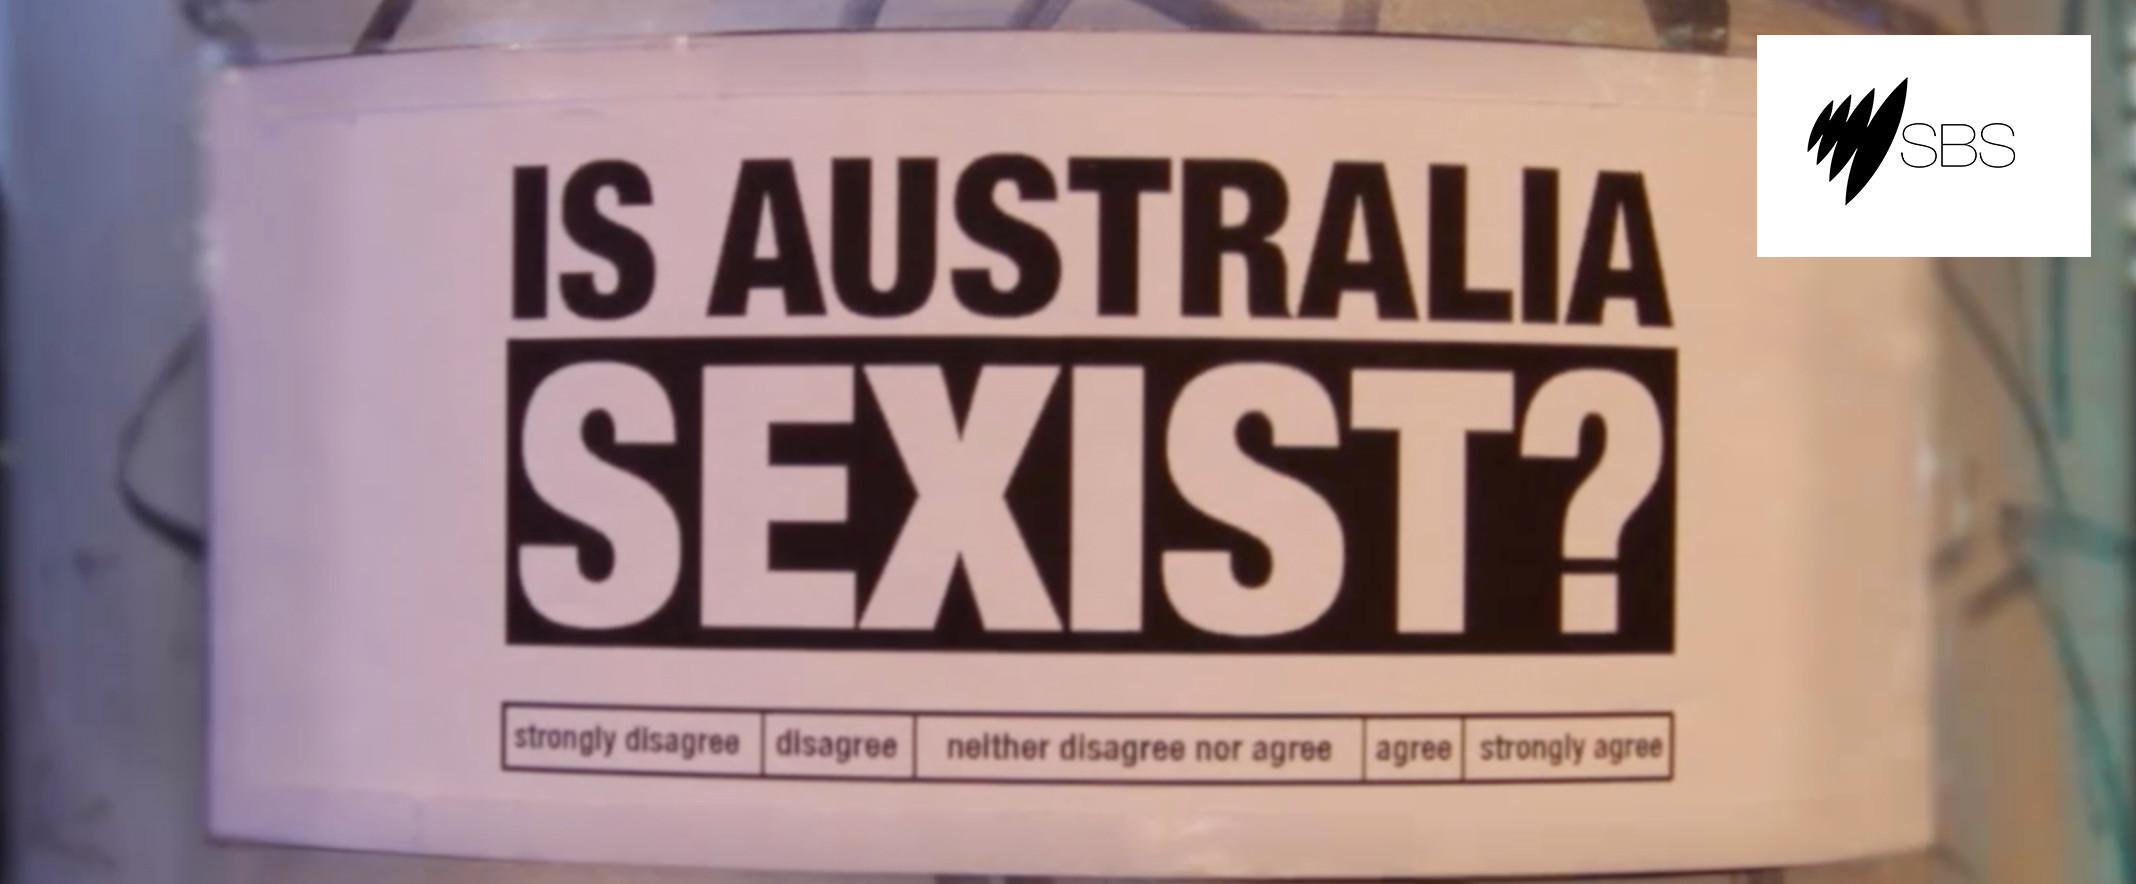 Is Australia Sexist Promo.jpg